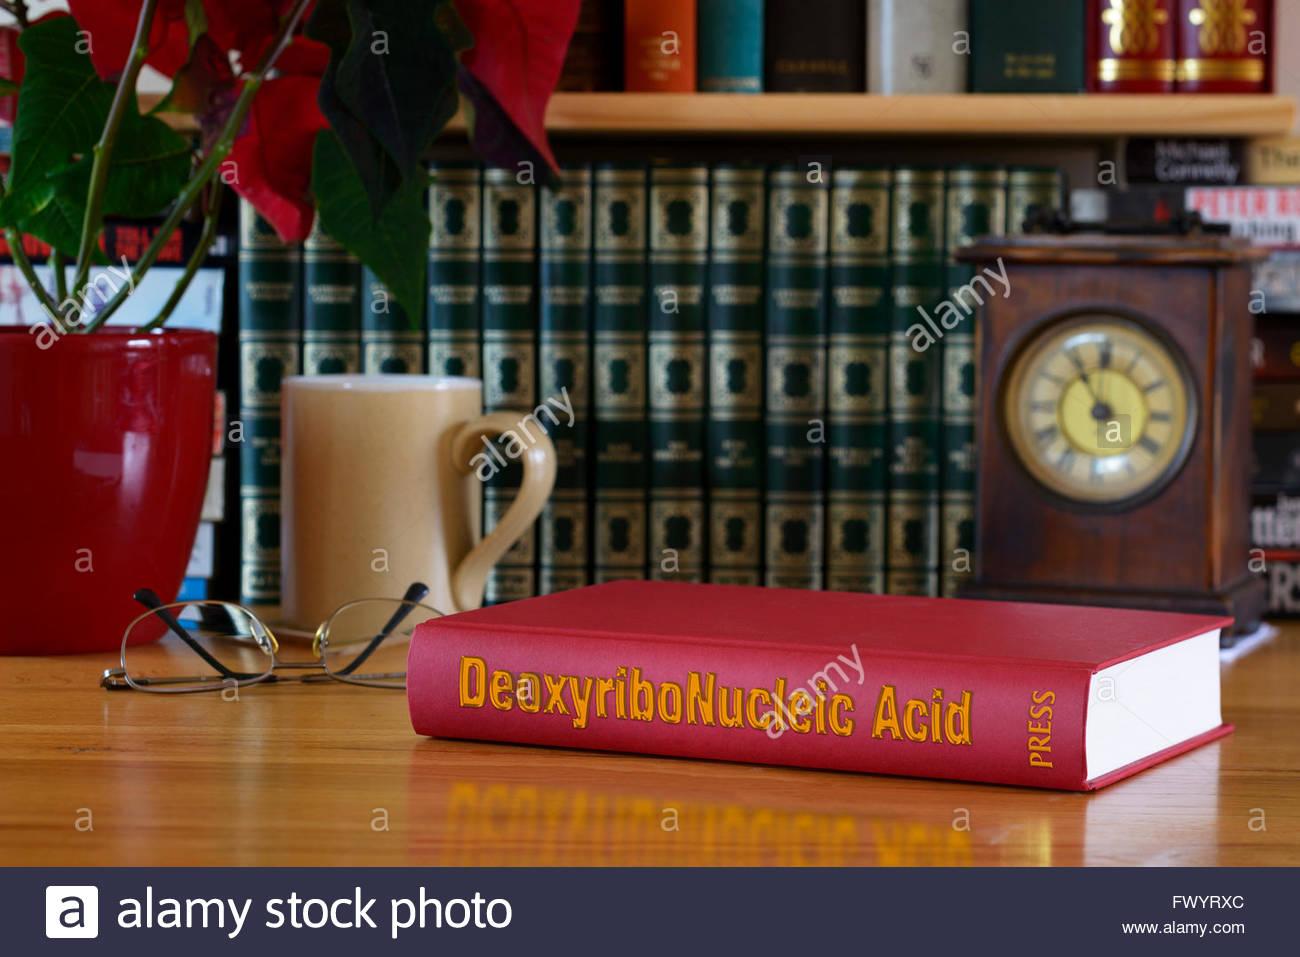 Deoxyribonucleic acid book title on desk, England - Stock Image